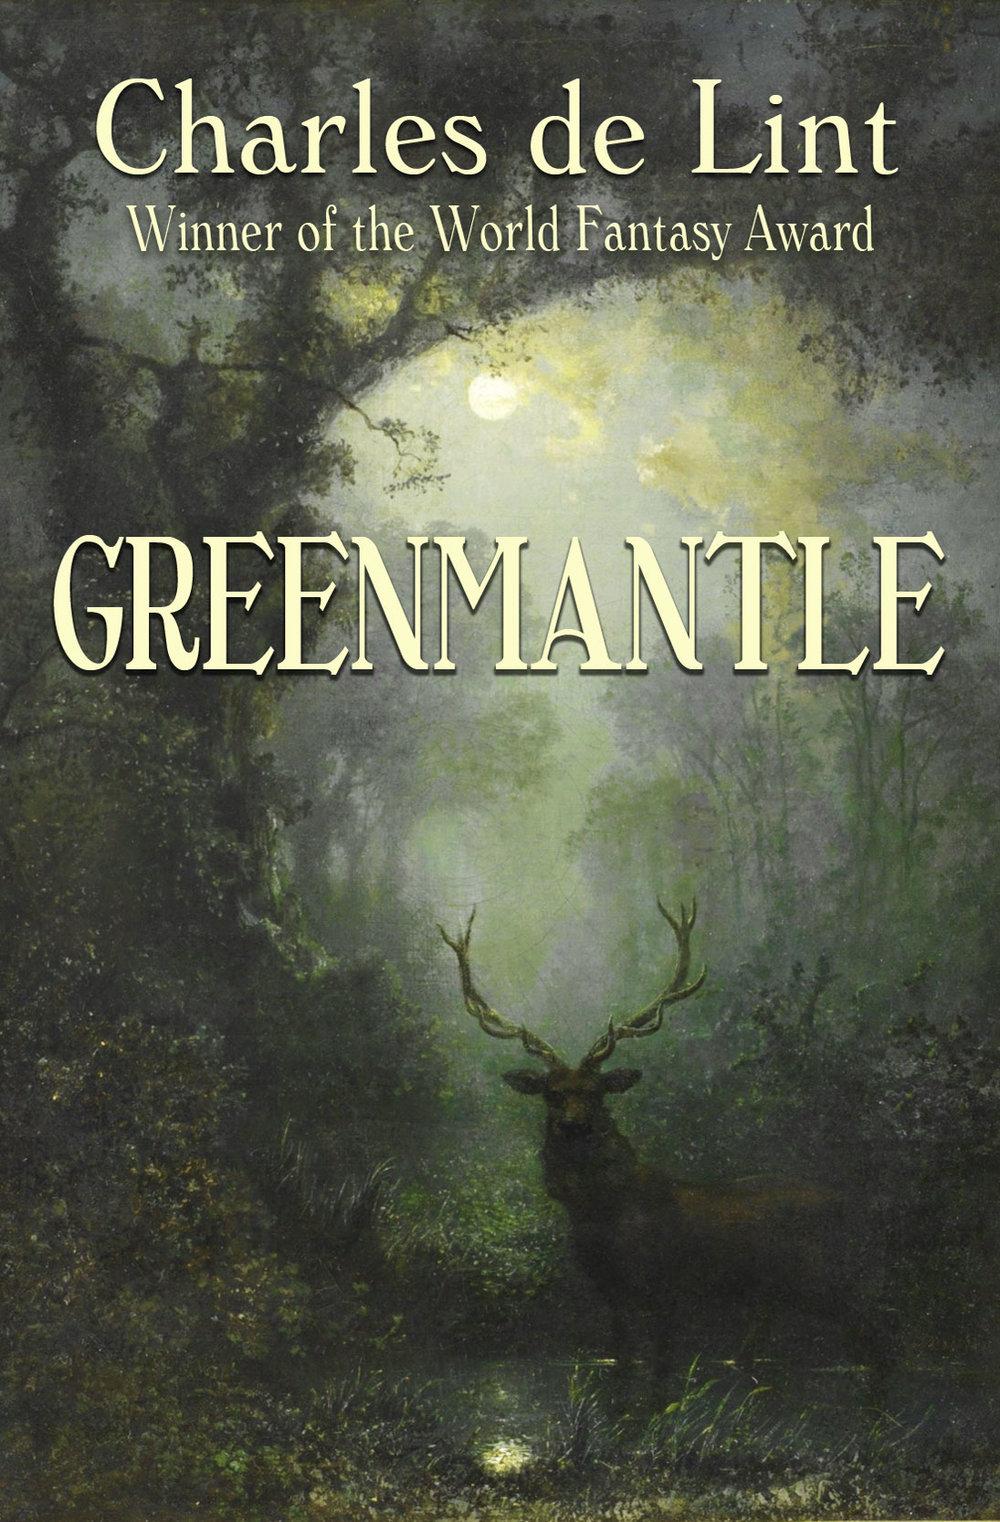 greenmantle_tp.jpg